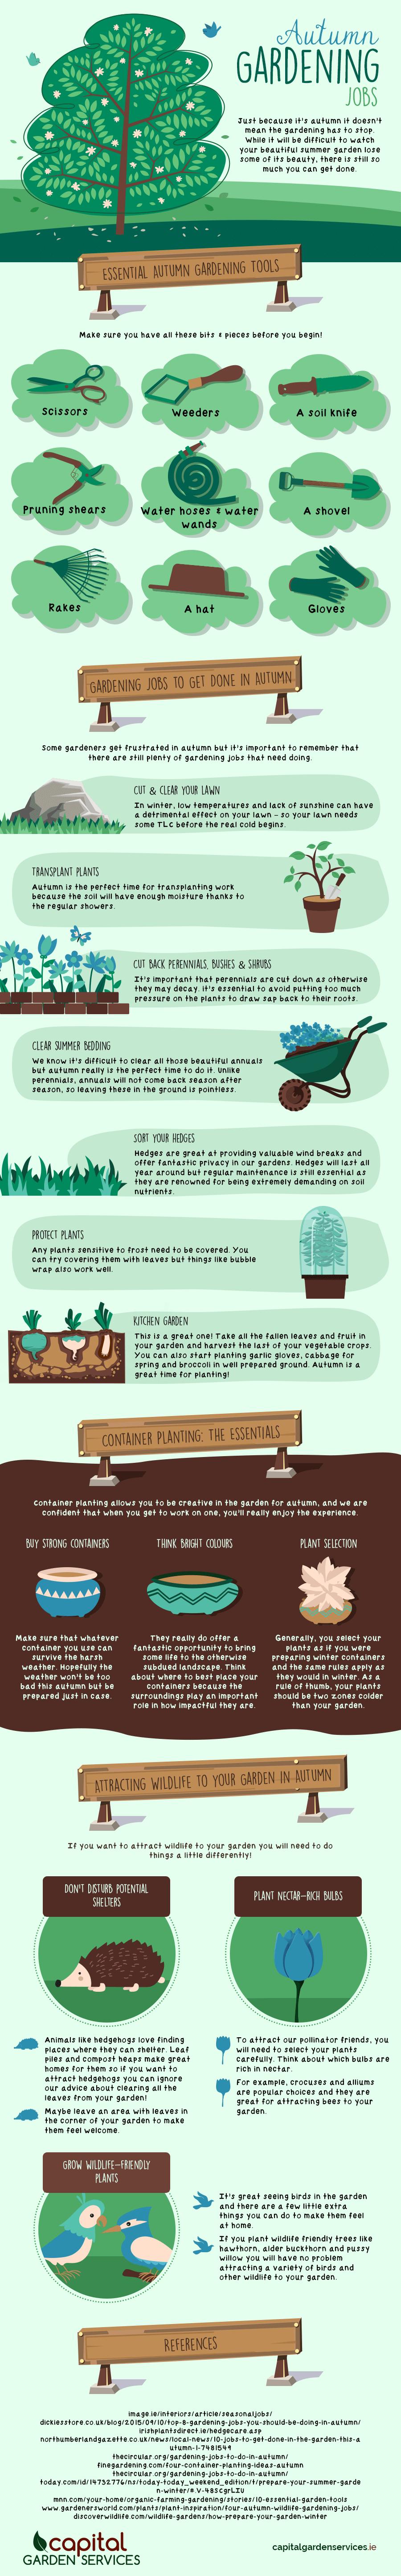 Autumn-Gardening-Jobs-infographic-plaza